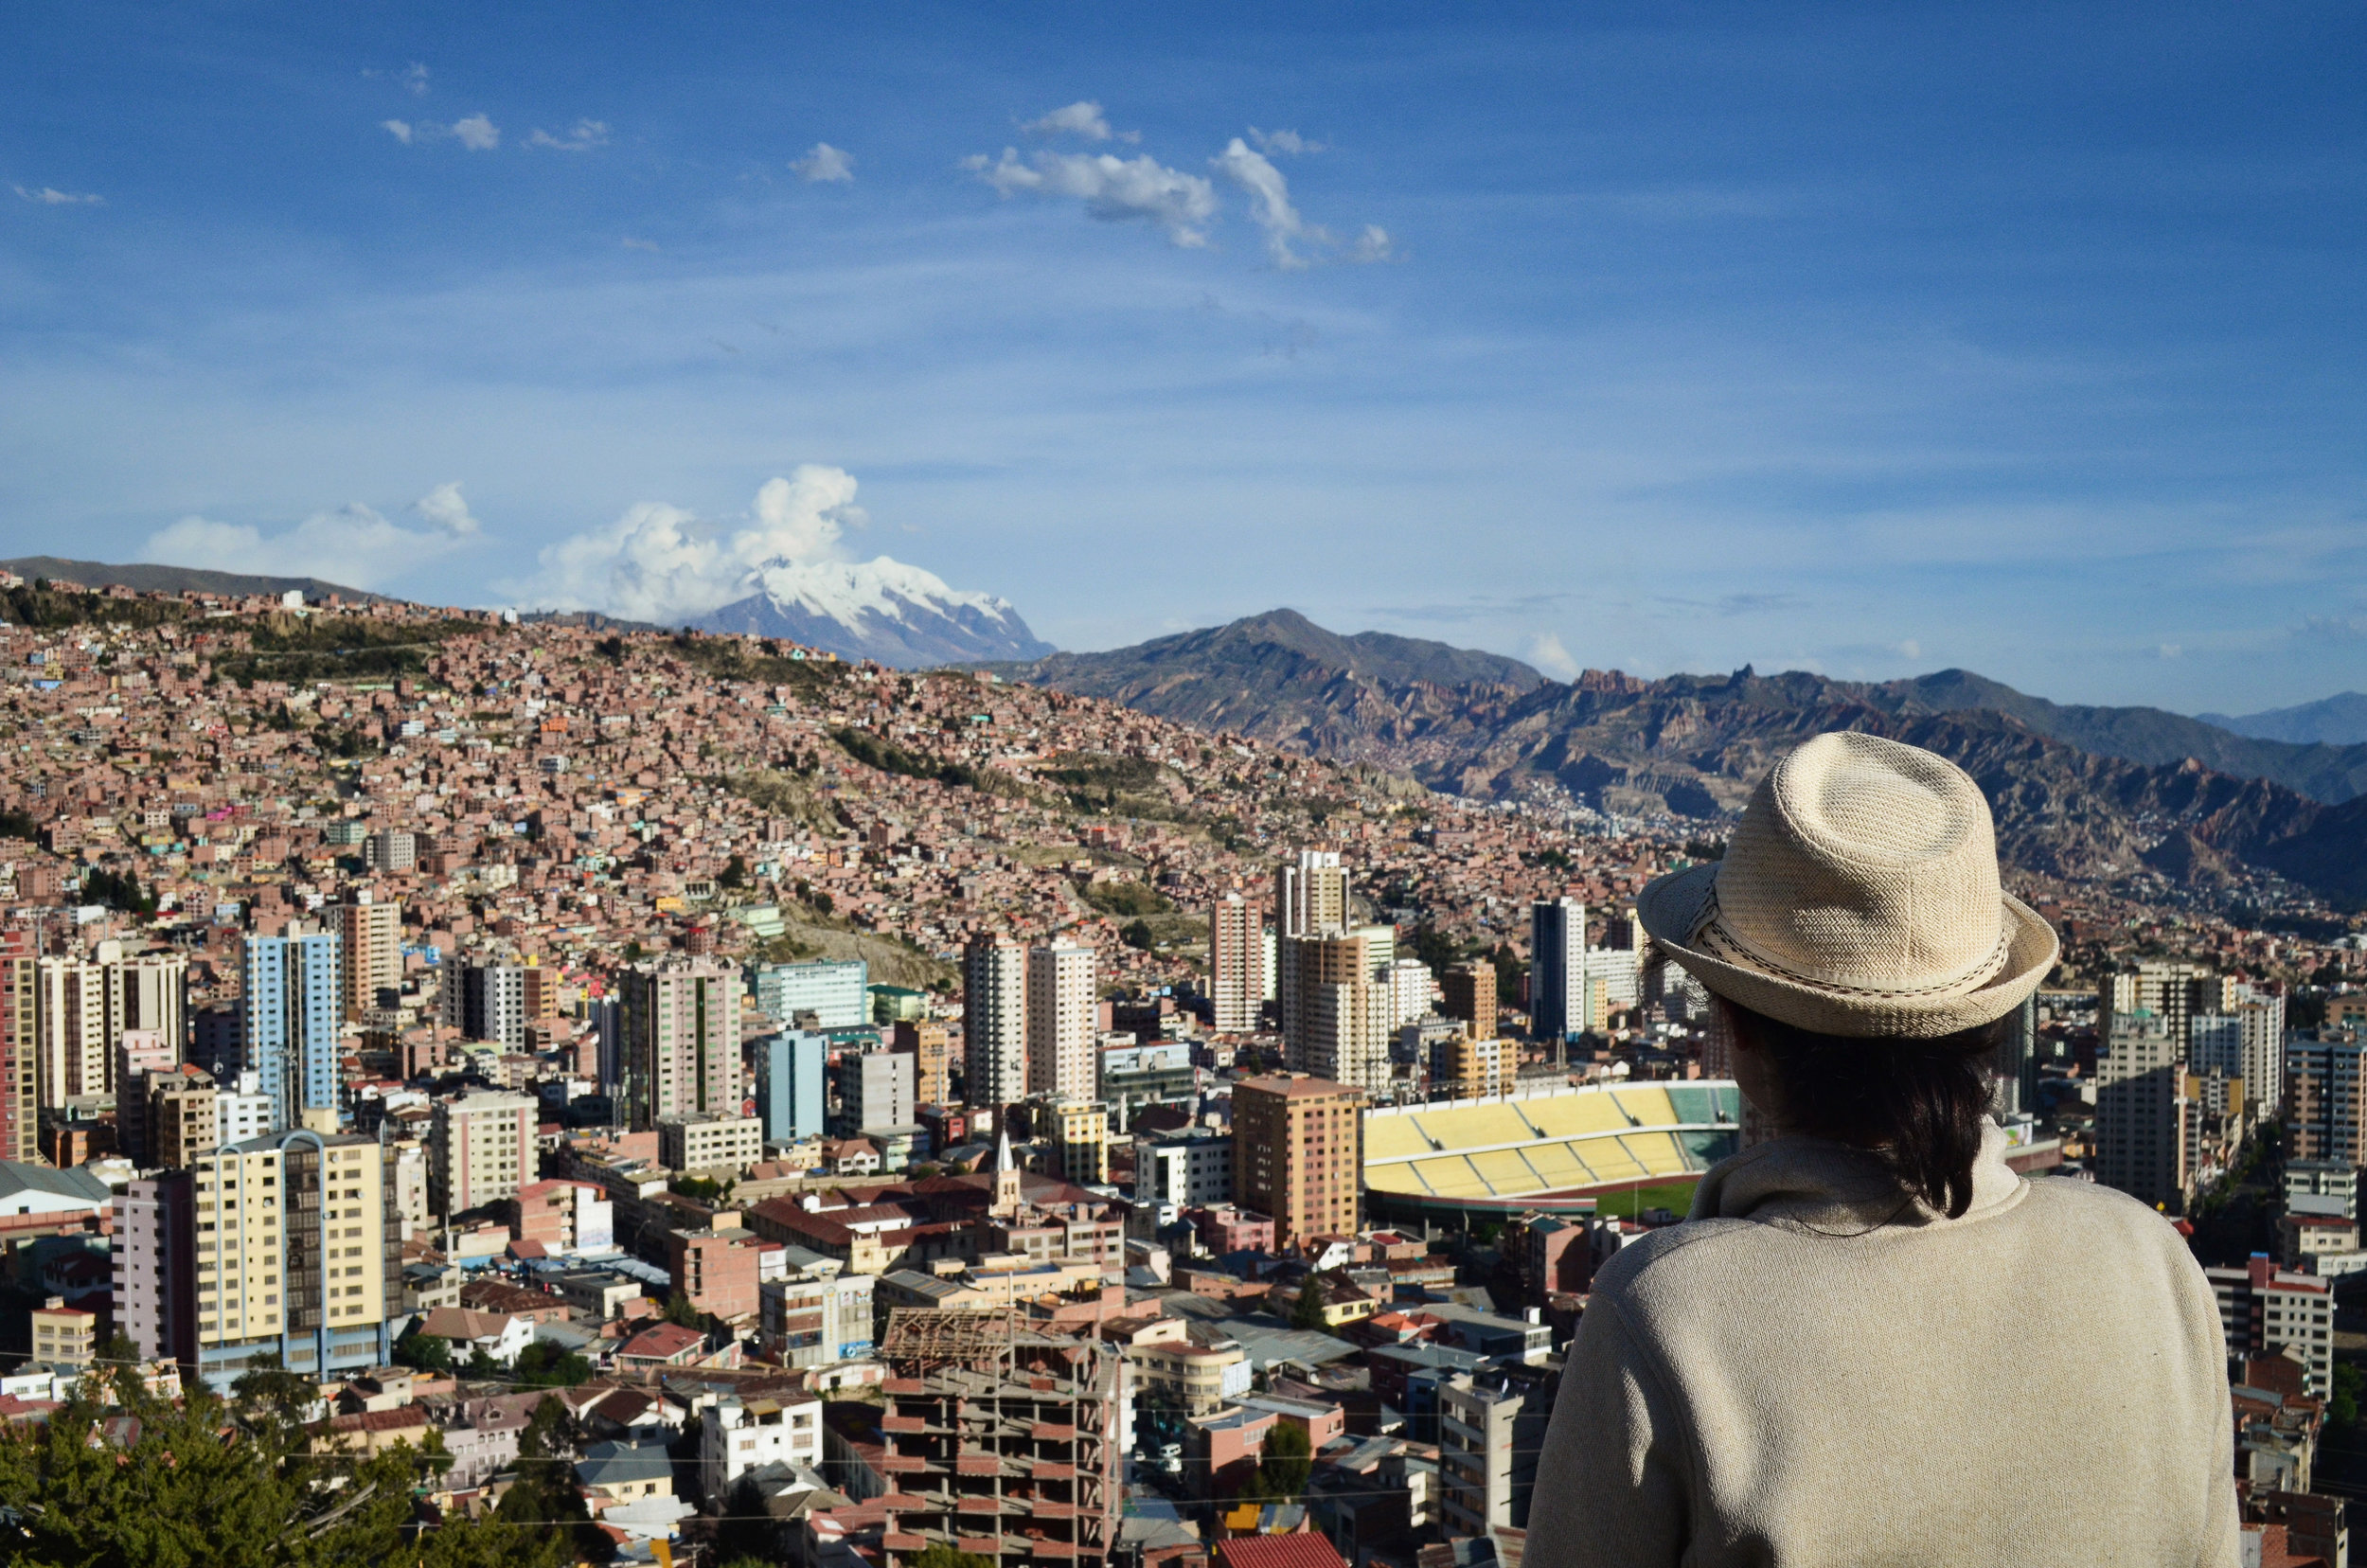 The La Paz horizon